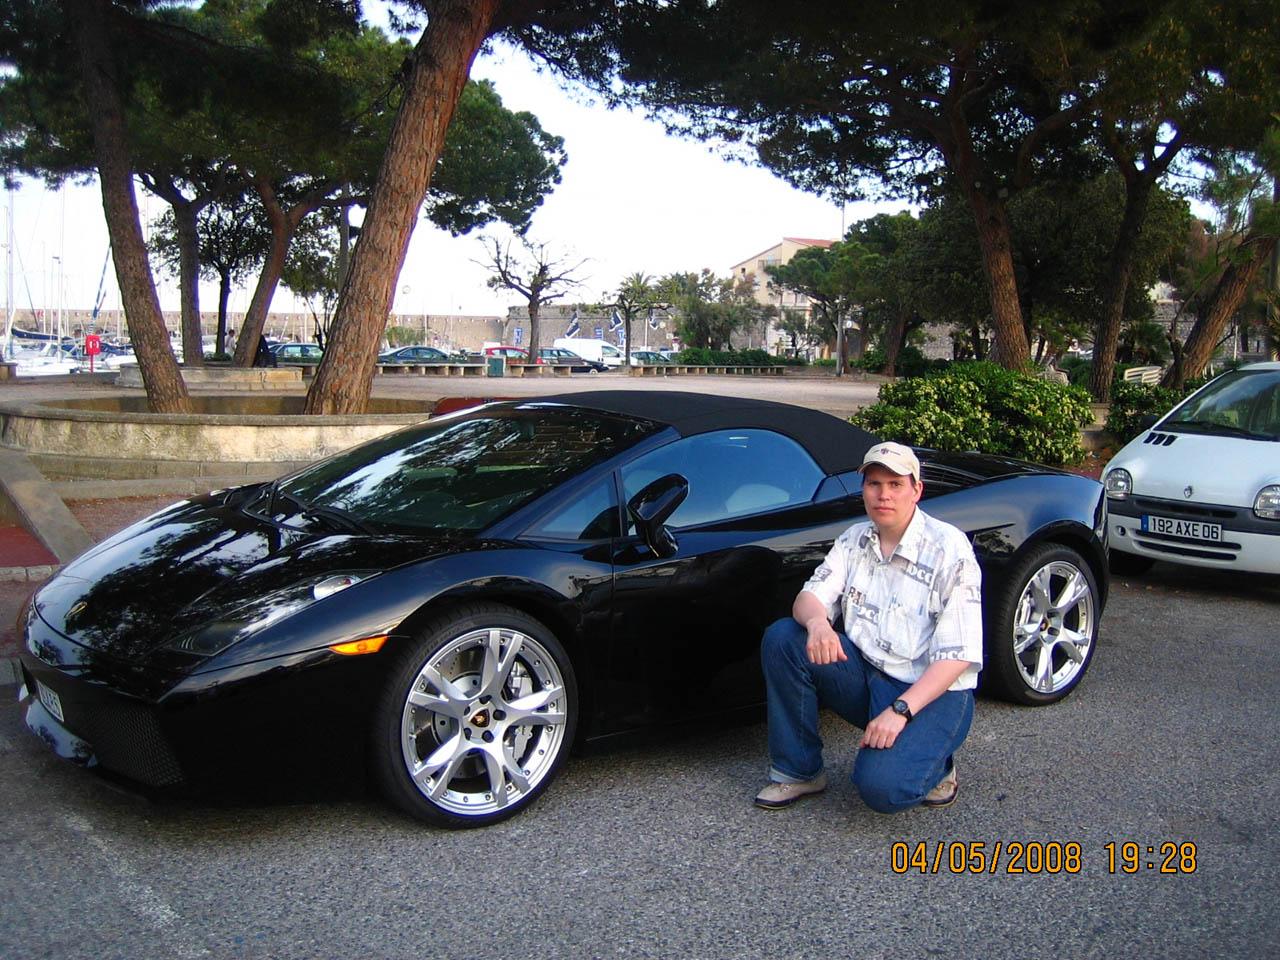 Фото на фоне машины